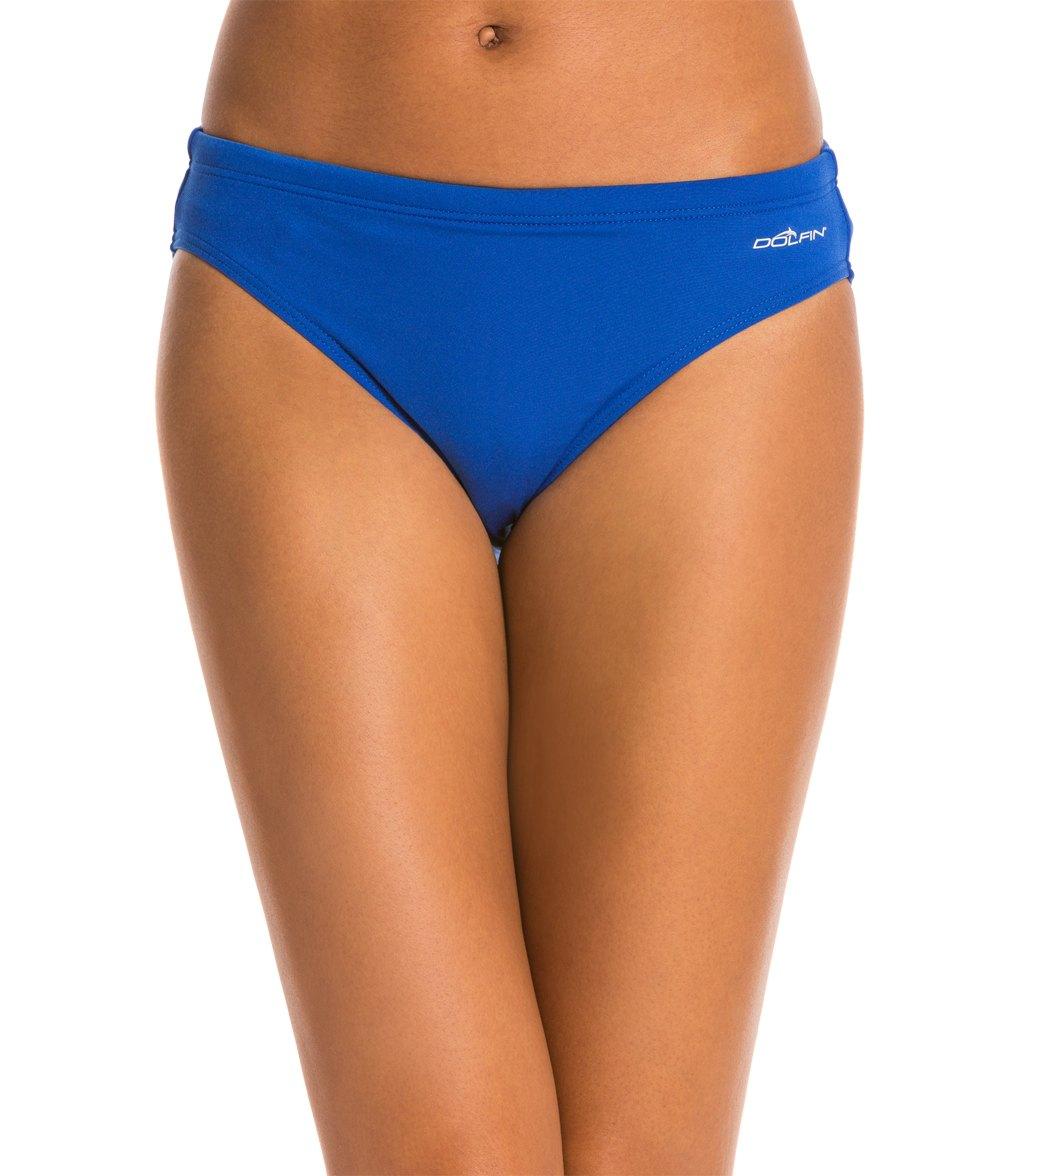 Dolfin Lifeguard Bikini Bottom Swimsuit